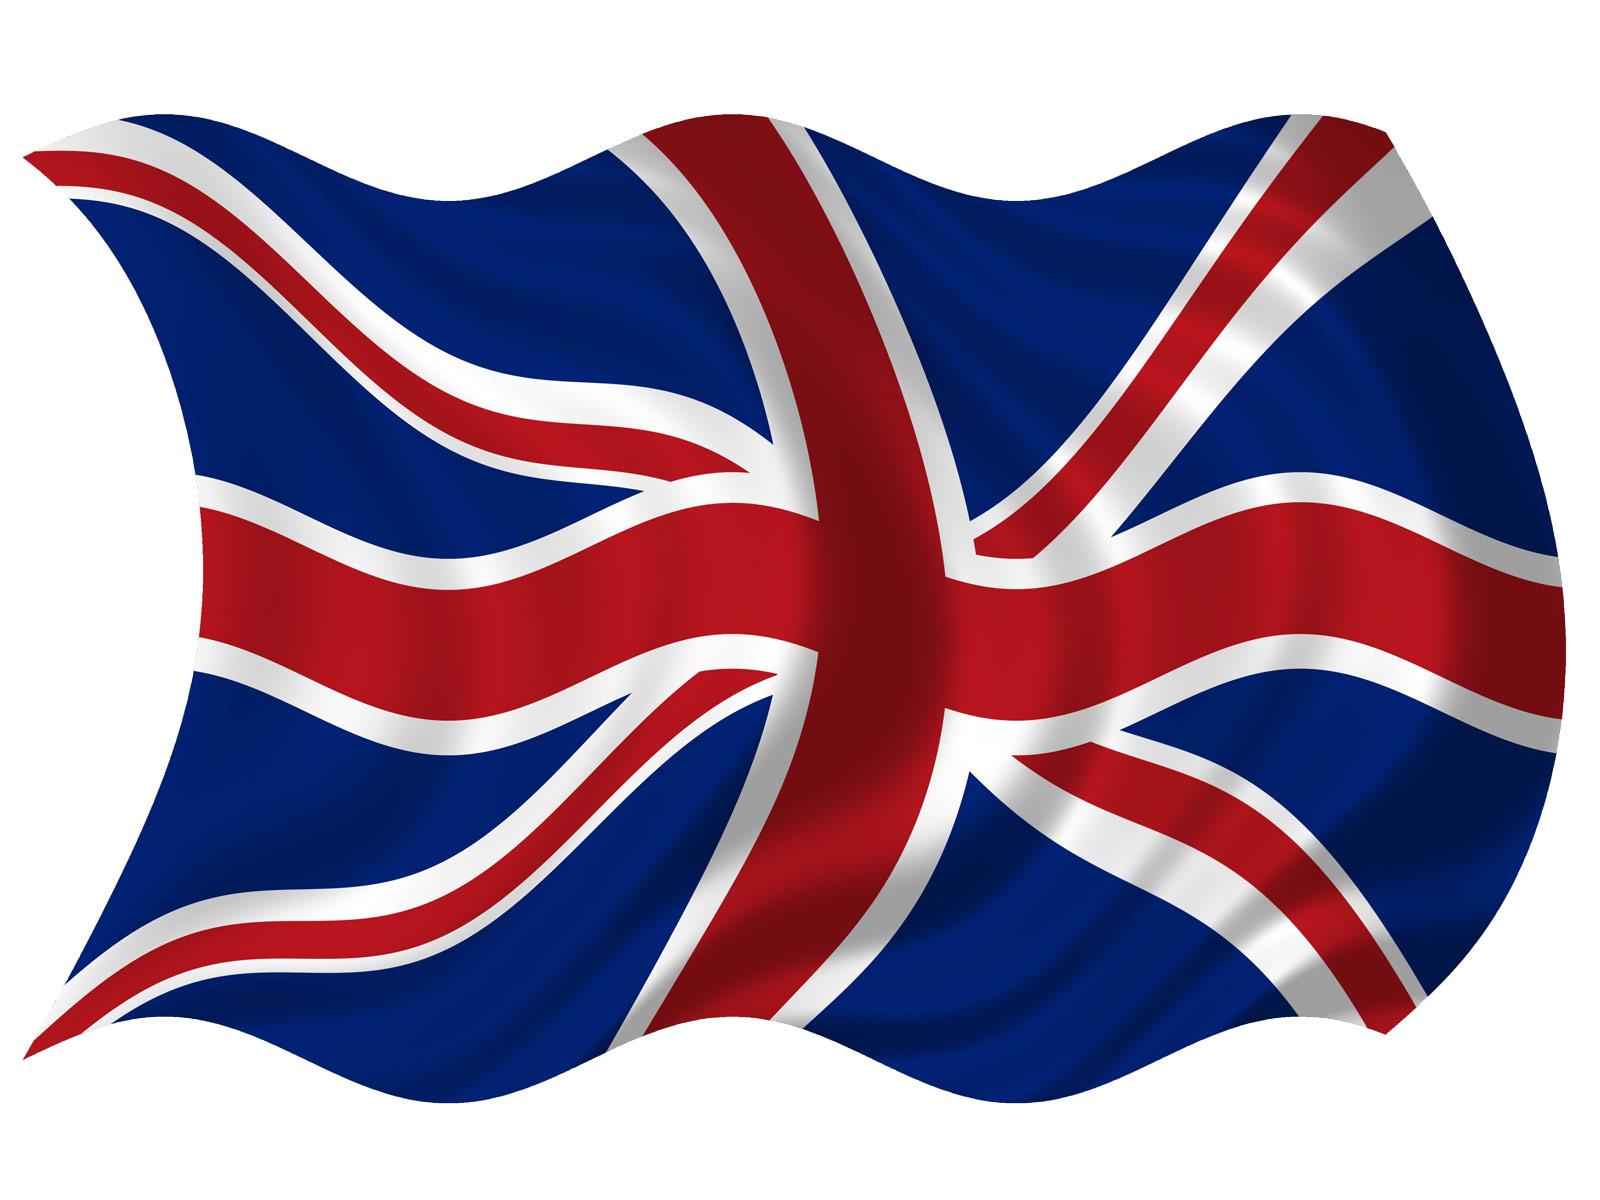 Union jack british flag wallpaper hd 7134 high - Uk flag images free ...